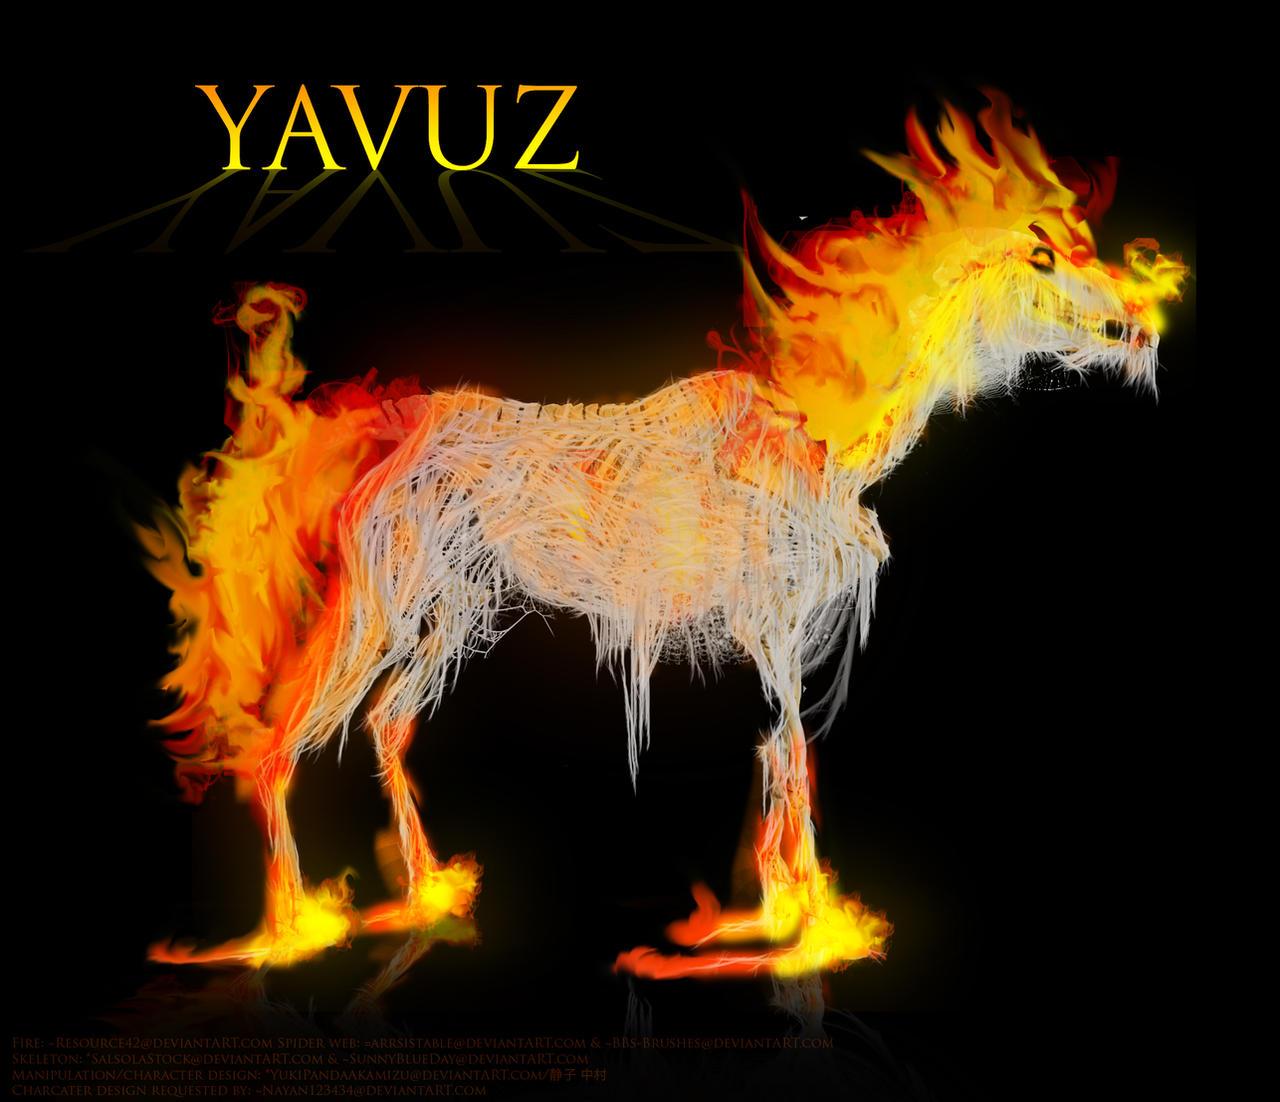 OC REQUEST: Yavuz by NEFUR-STUDIOS